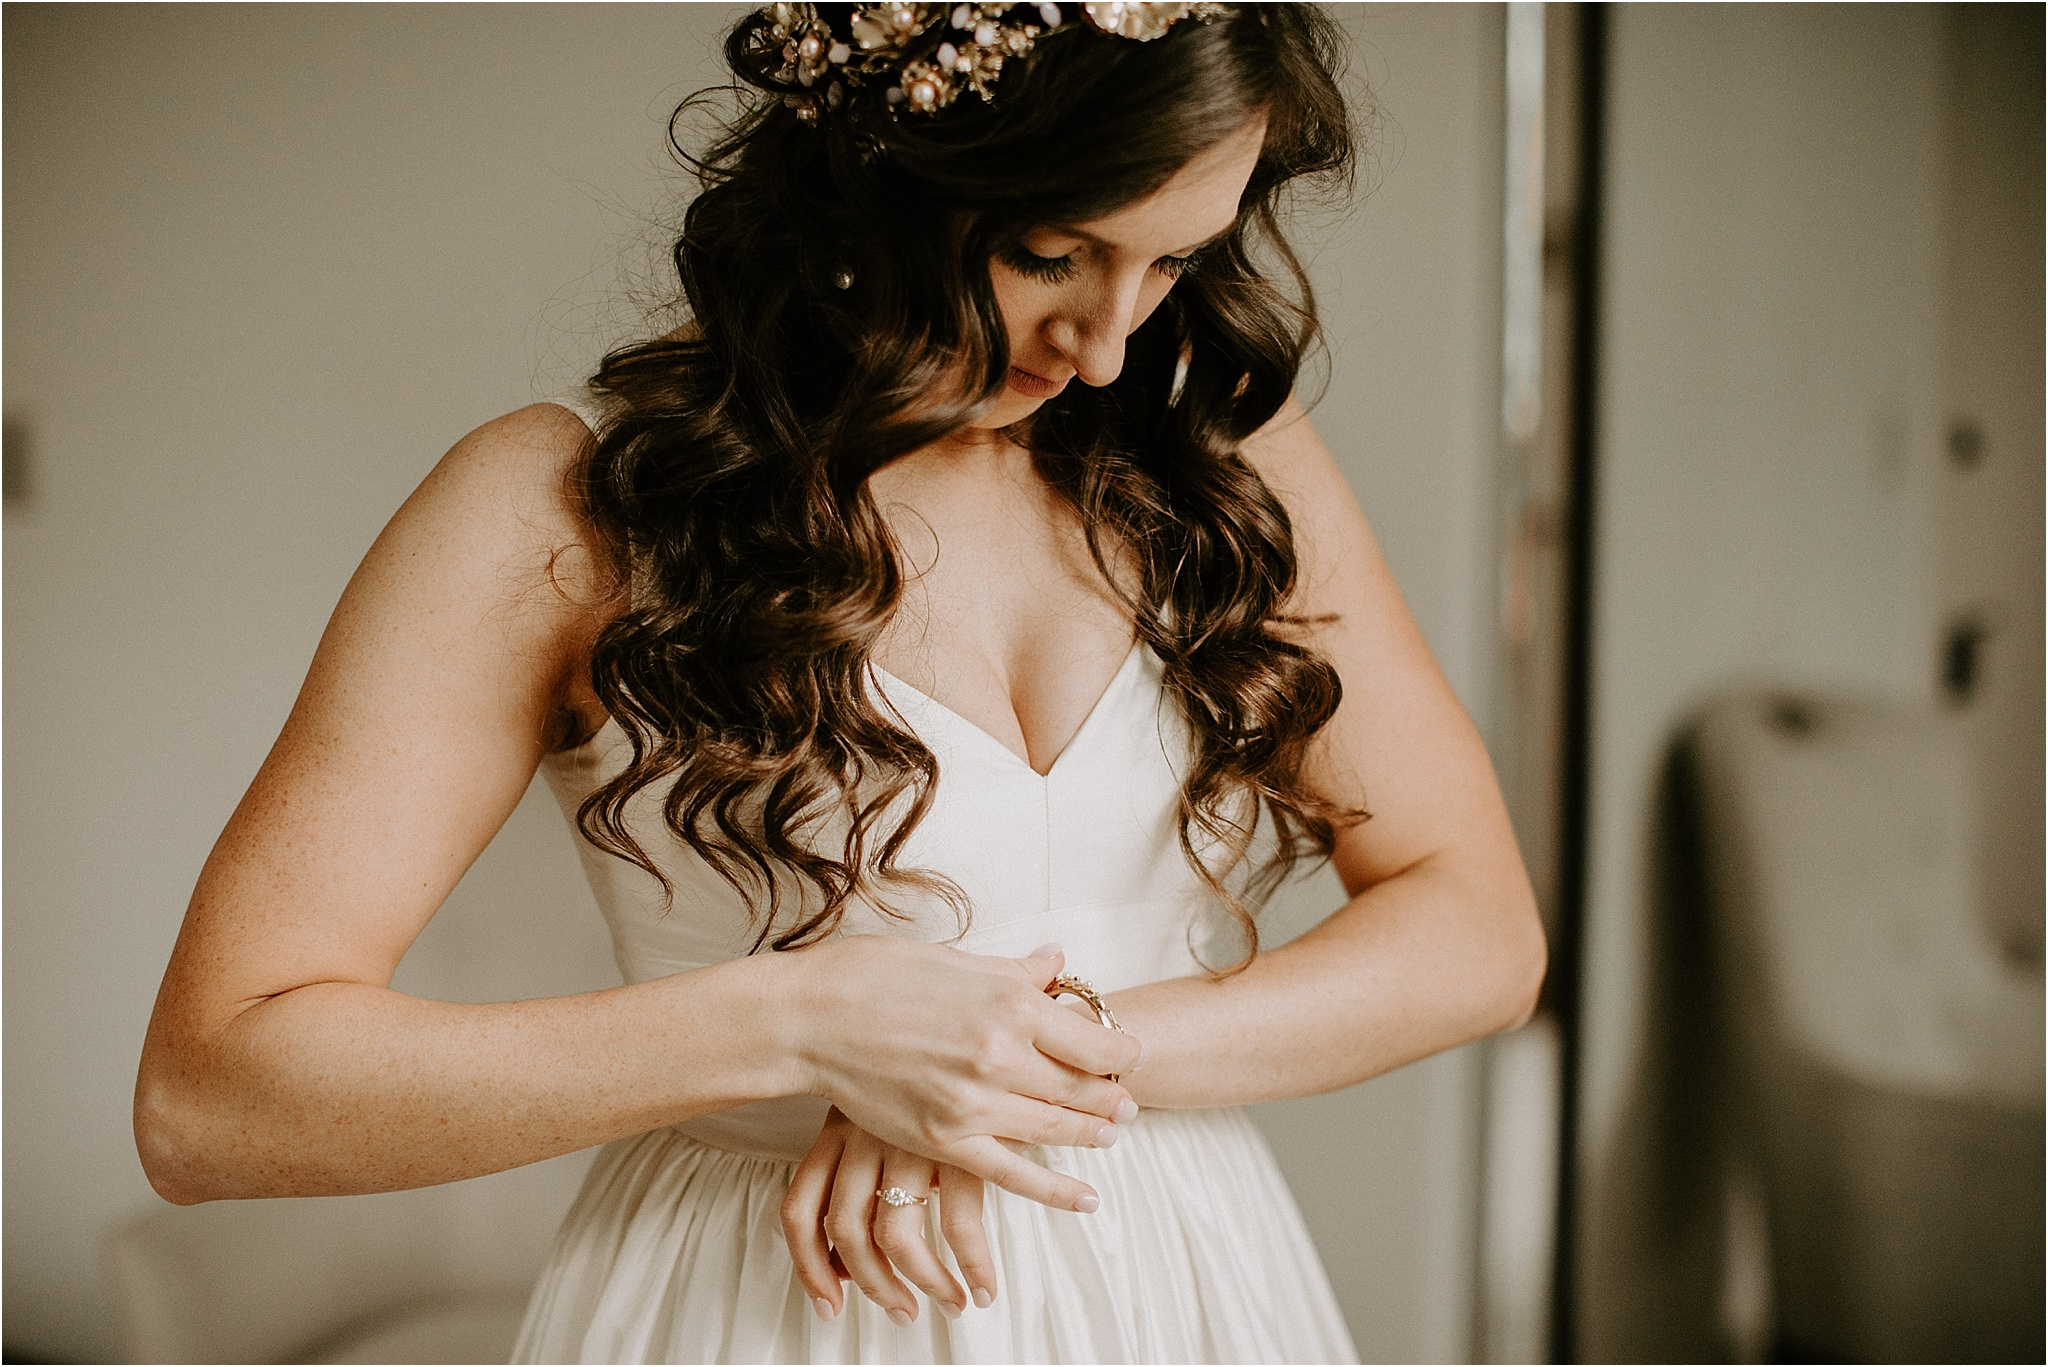 Sarah_Brookhart_Farm_at_Eagles_Ridge_Wedding_Photographer_0011.jpg